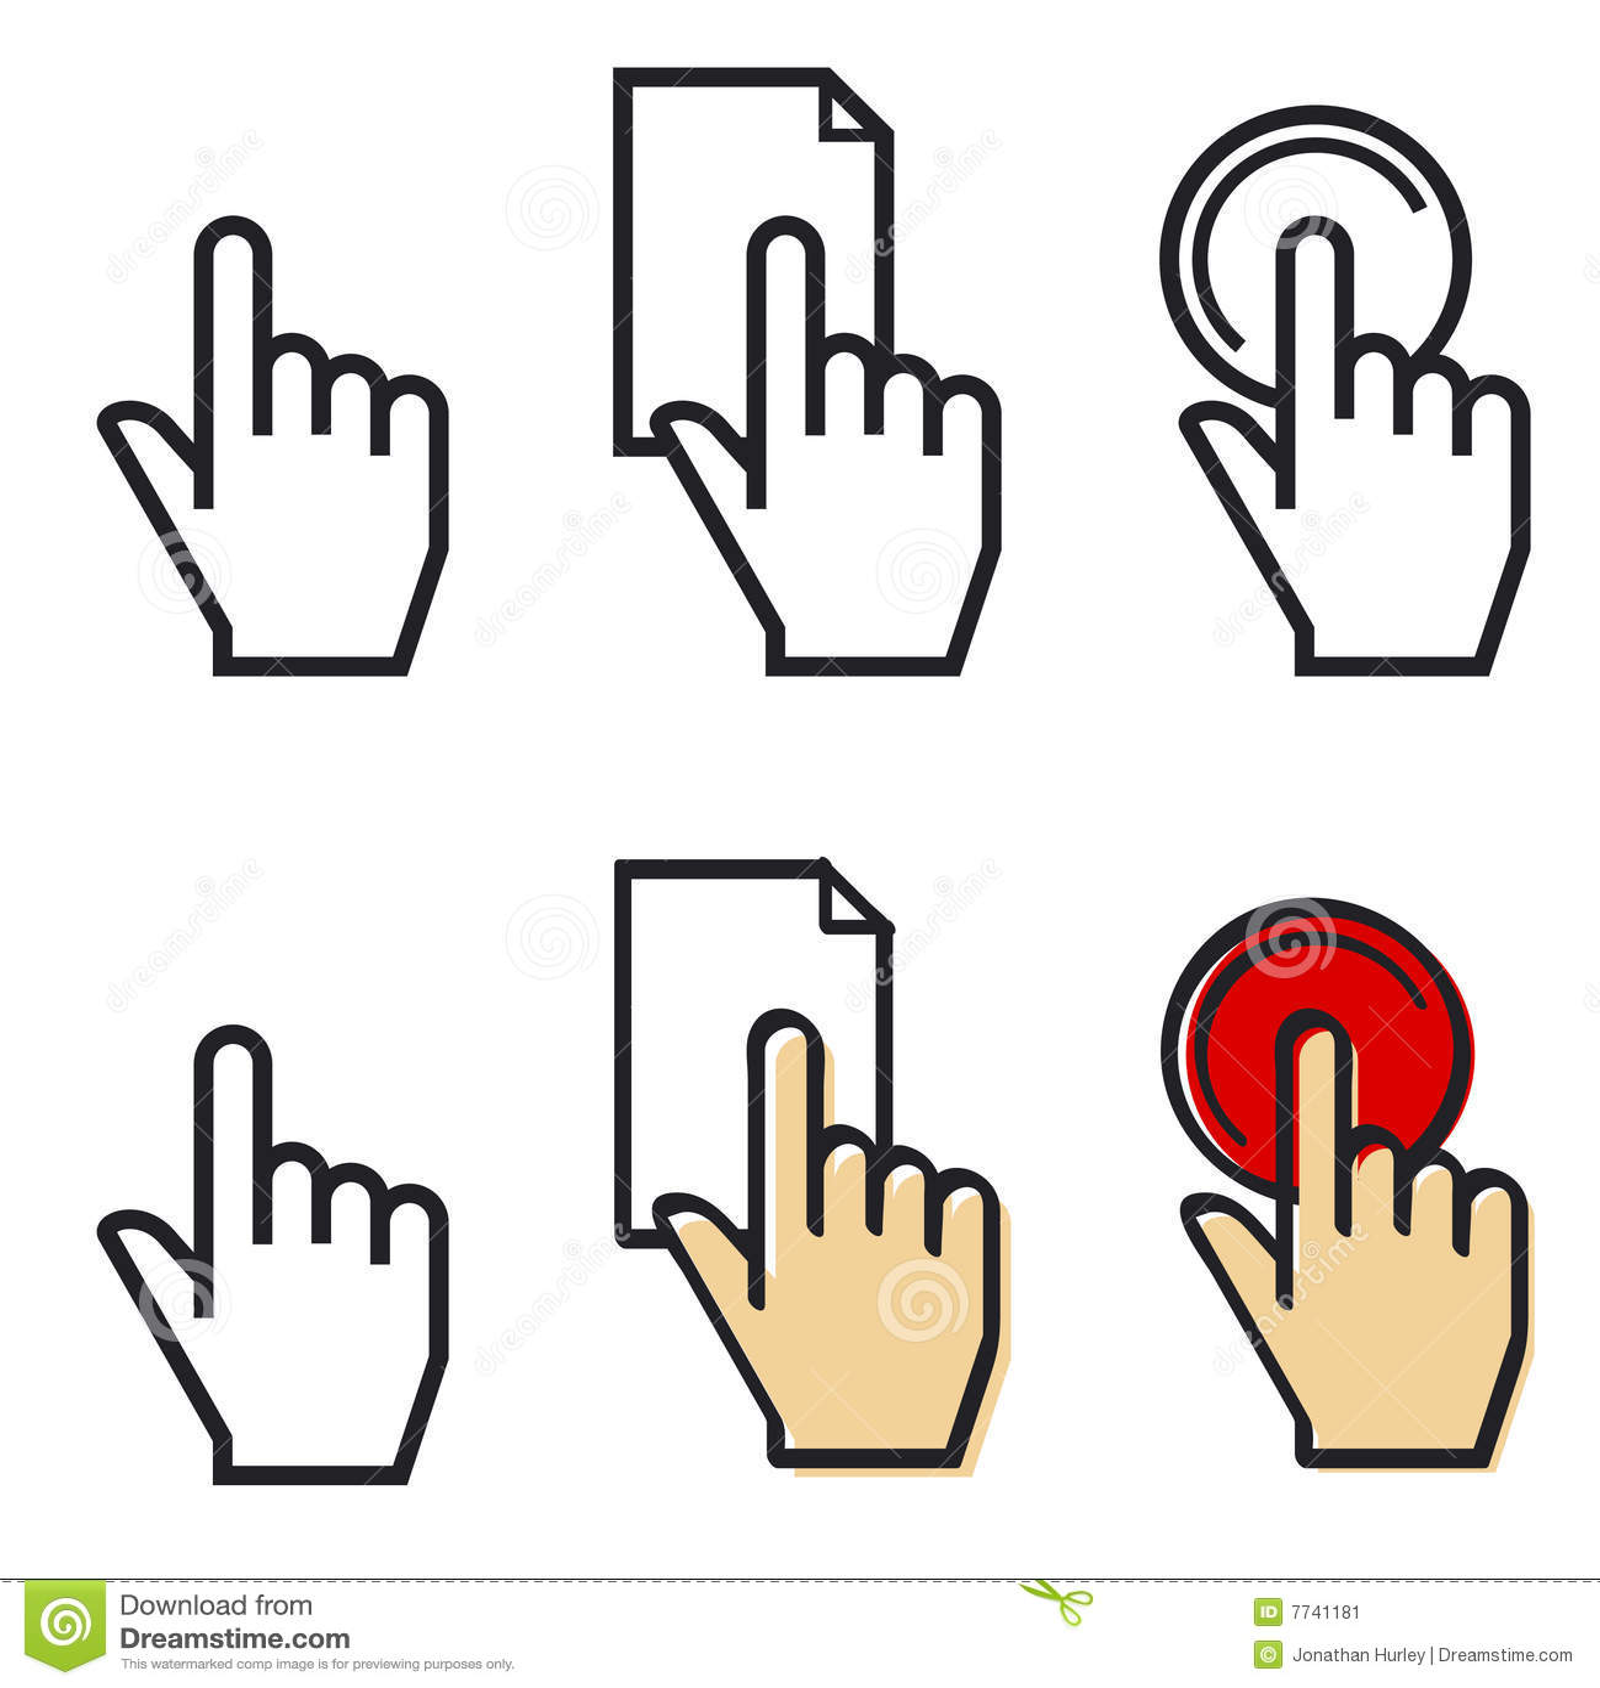 Cursor Hand Finger Stock Image - Image: 7741181